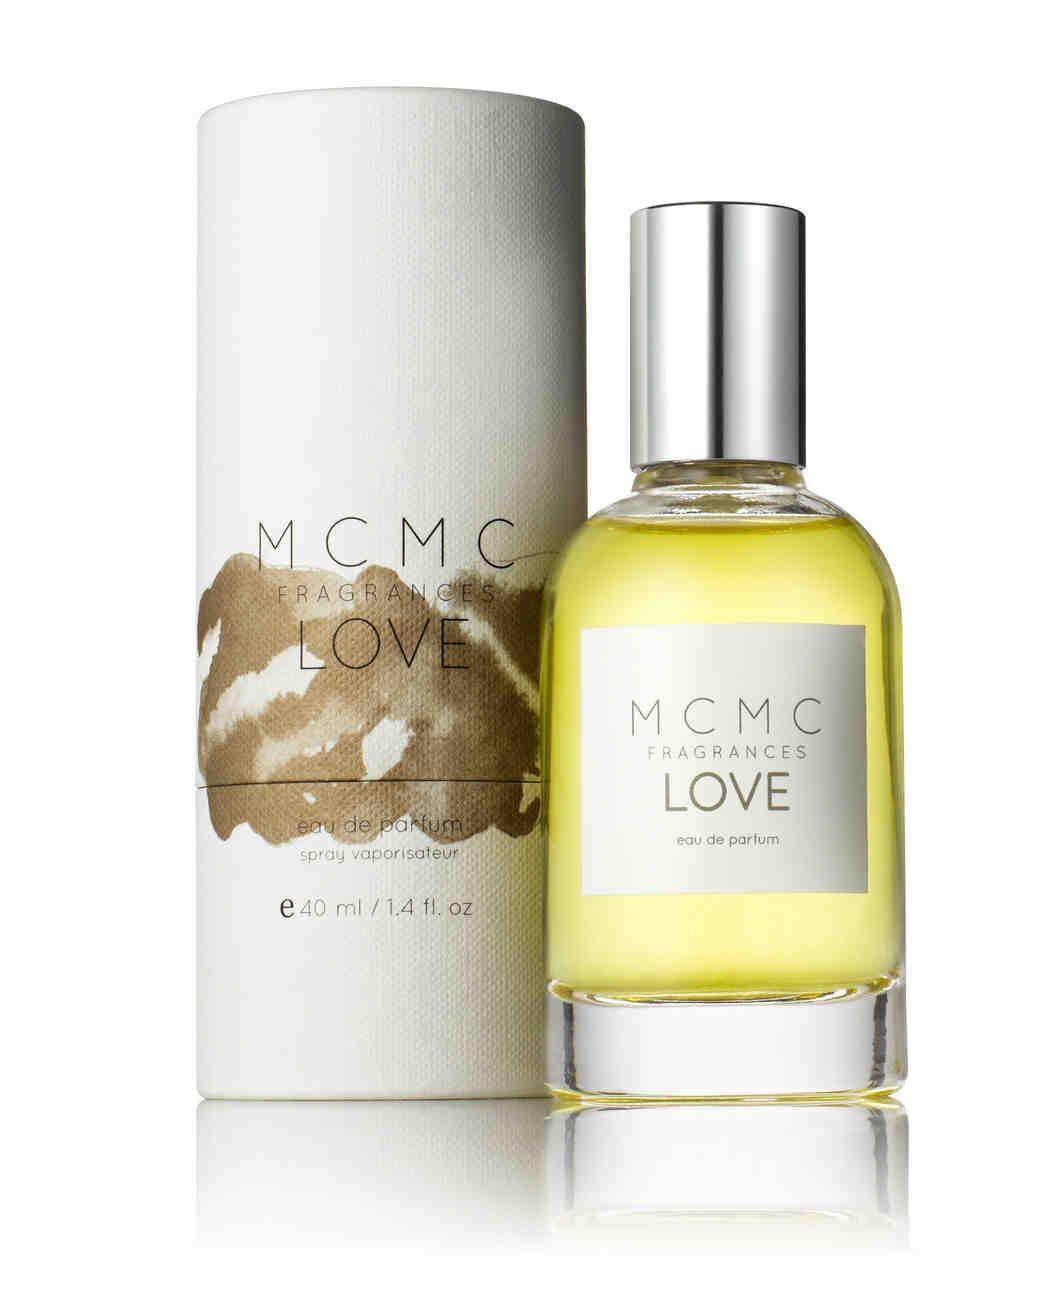 valentines-gift-guide-her-mcmc-perfume-0115.jpg